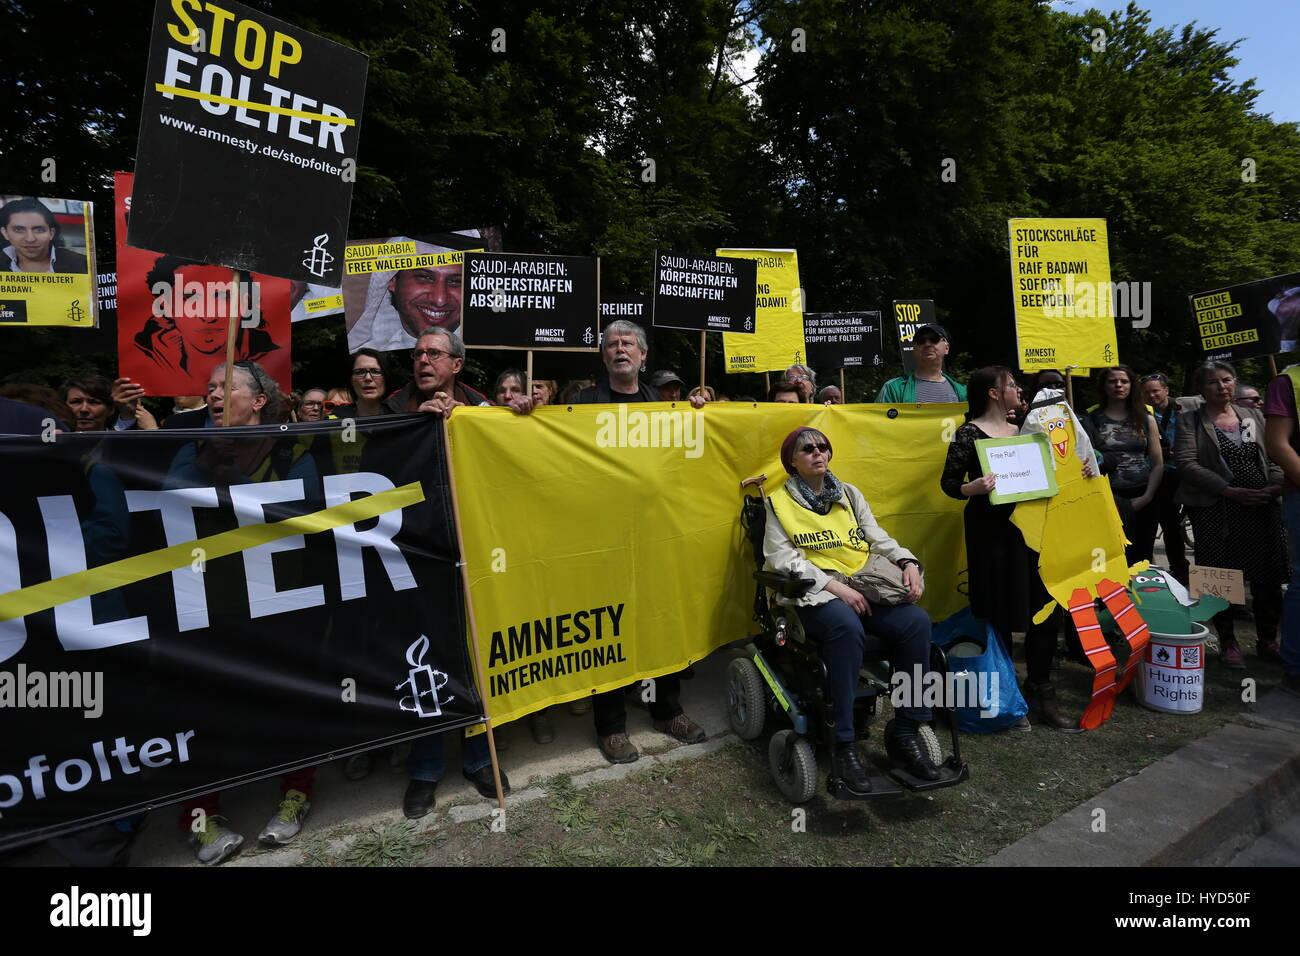 Berlin, Germany, May 22nd, 2015: Amnesty International and Ensaf Haidar protest to free Raif Badawi at Saudi-Arabian - Stock Image